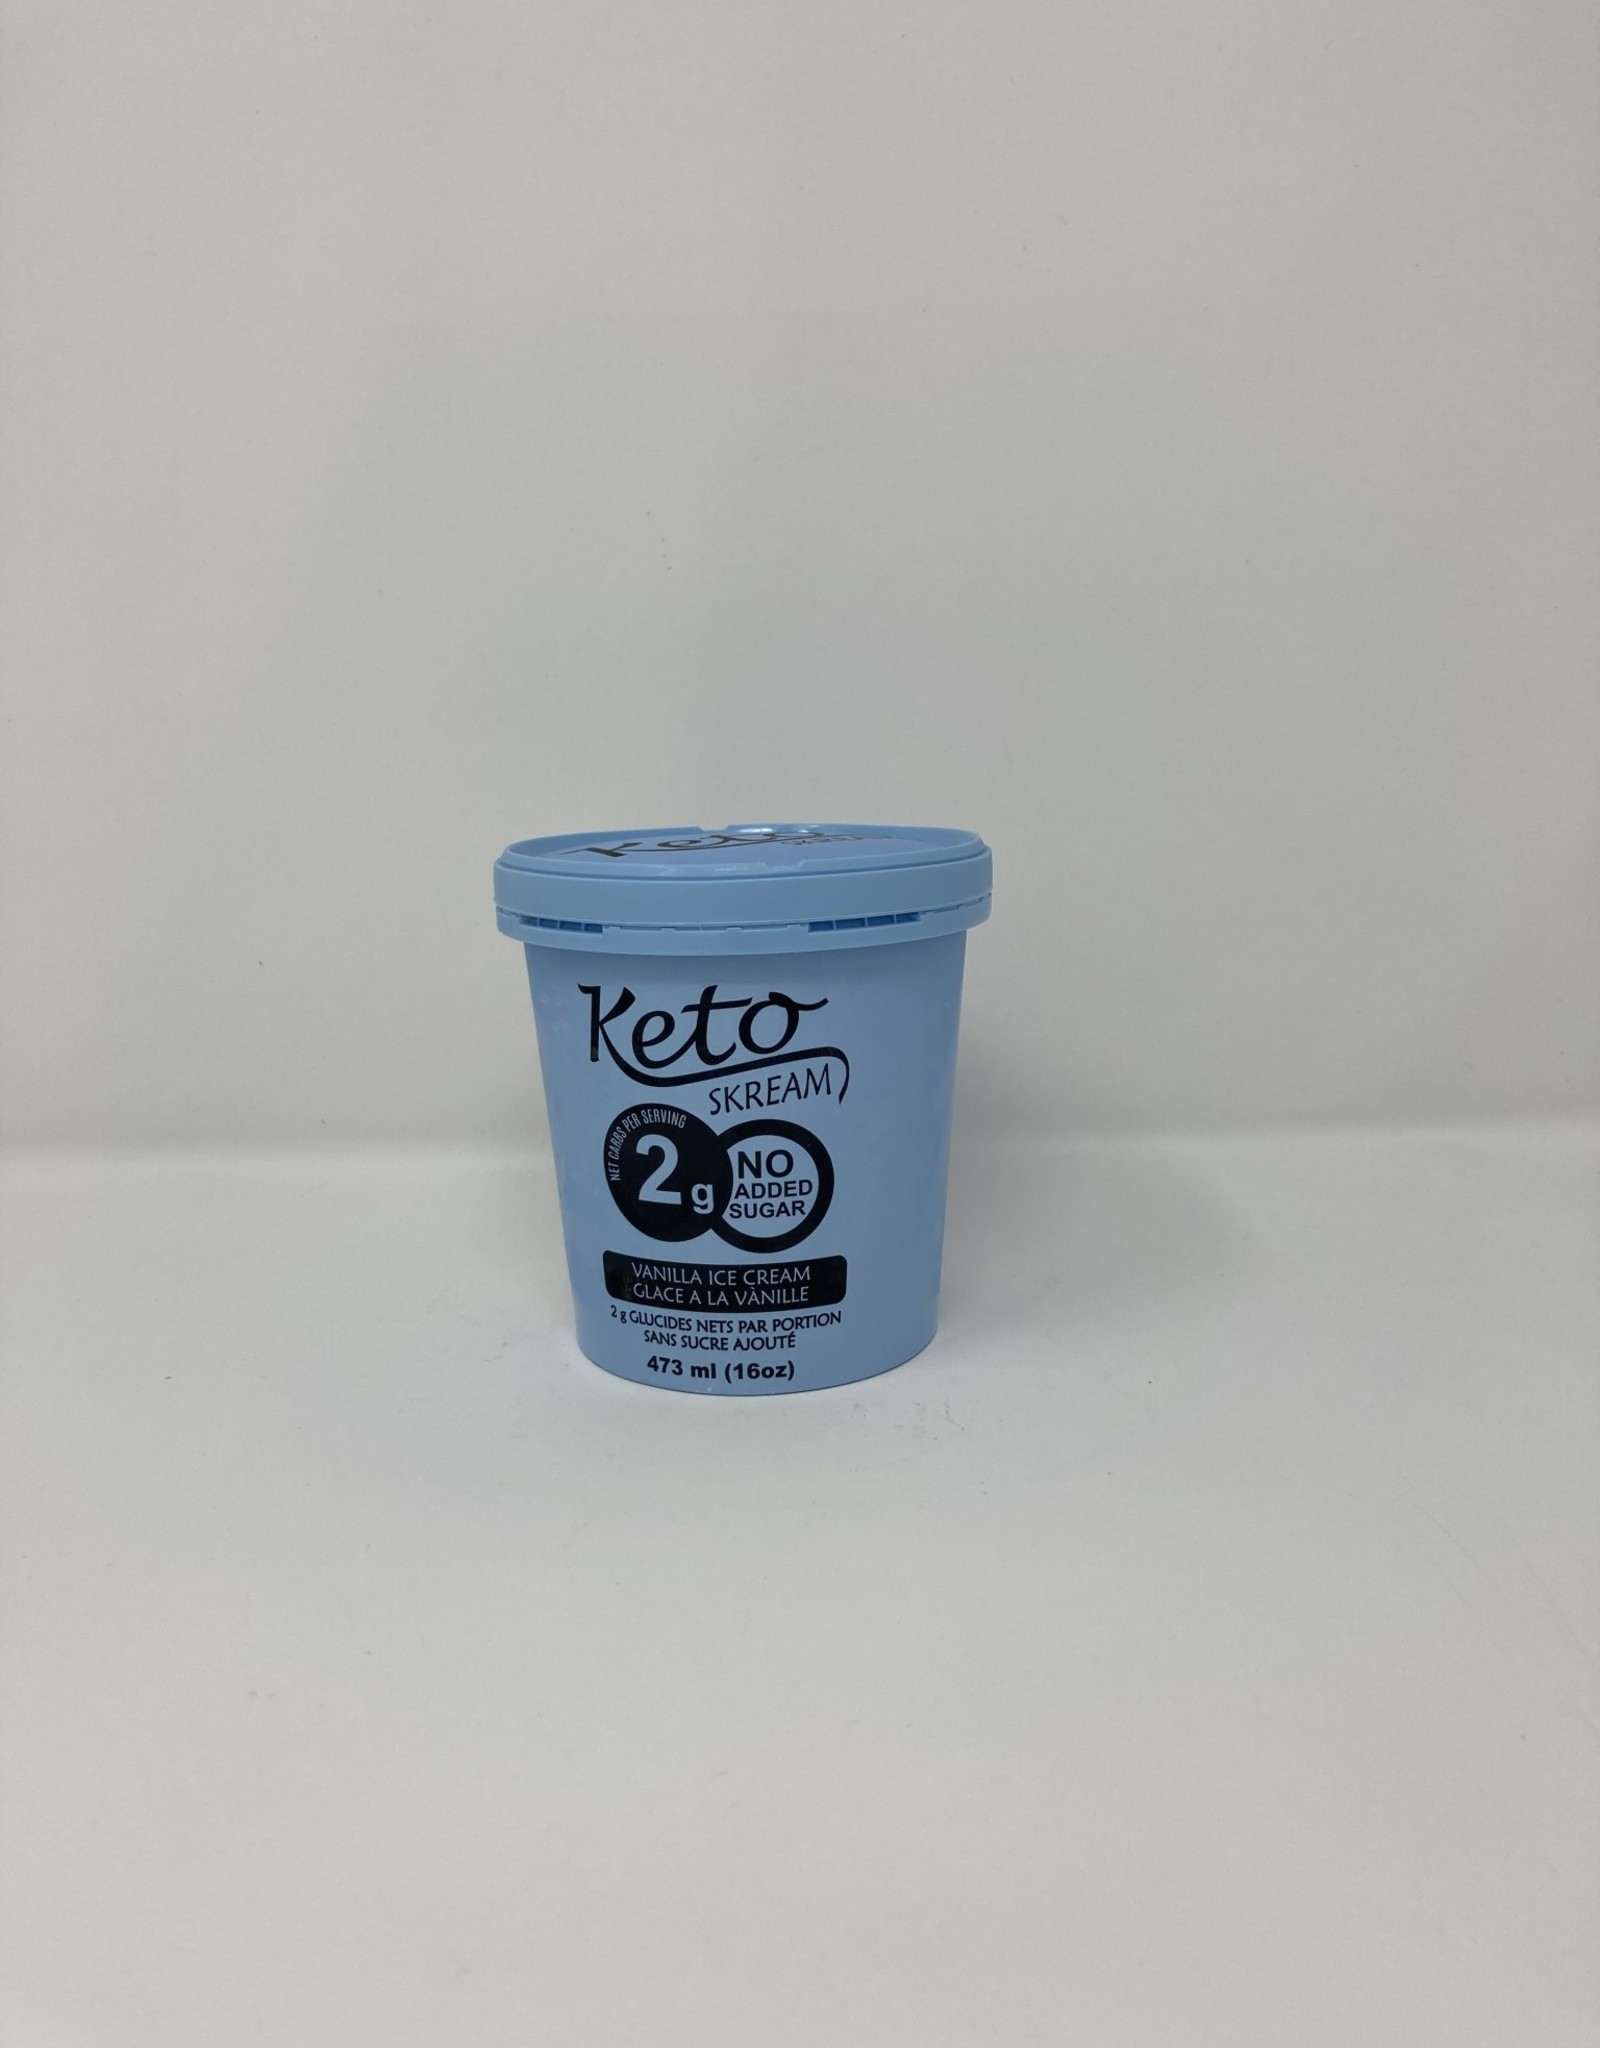 Keto Scream Keto Scream - Frozen Dessert, Vanilla